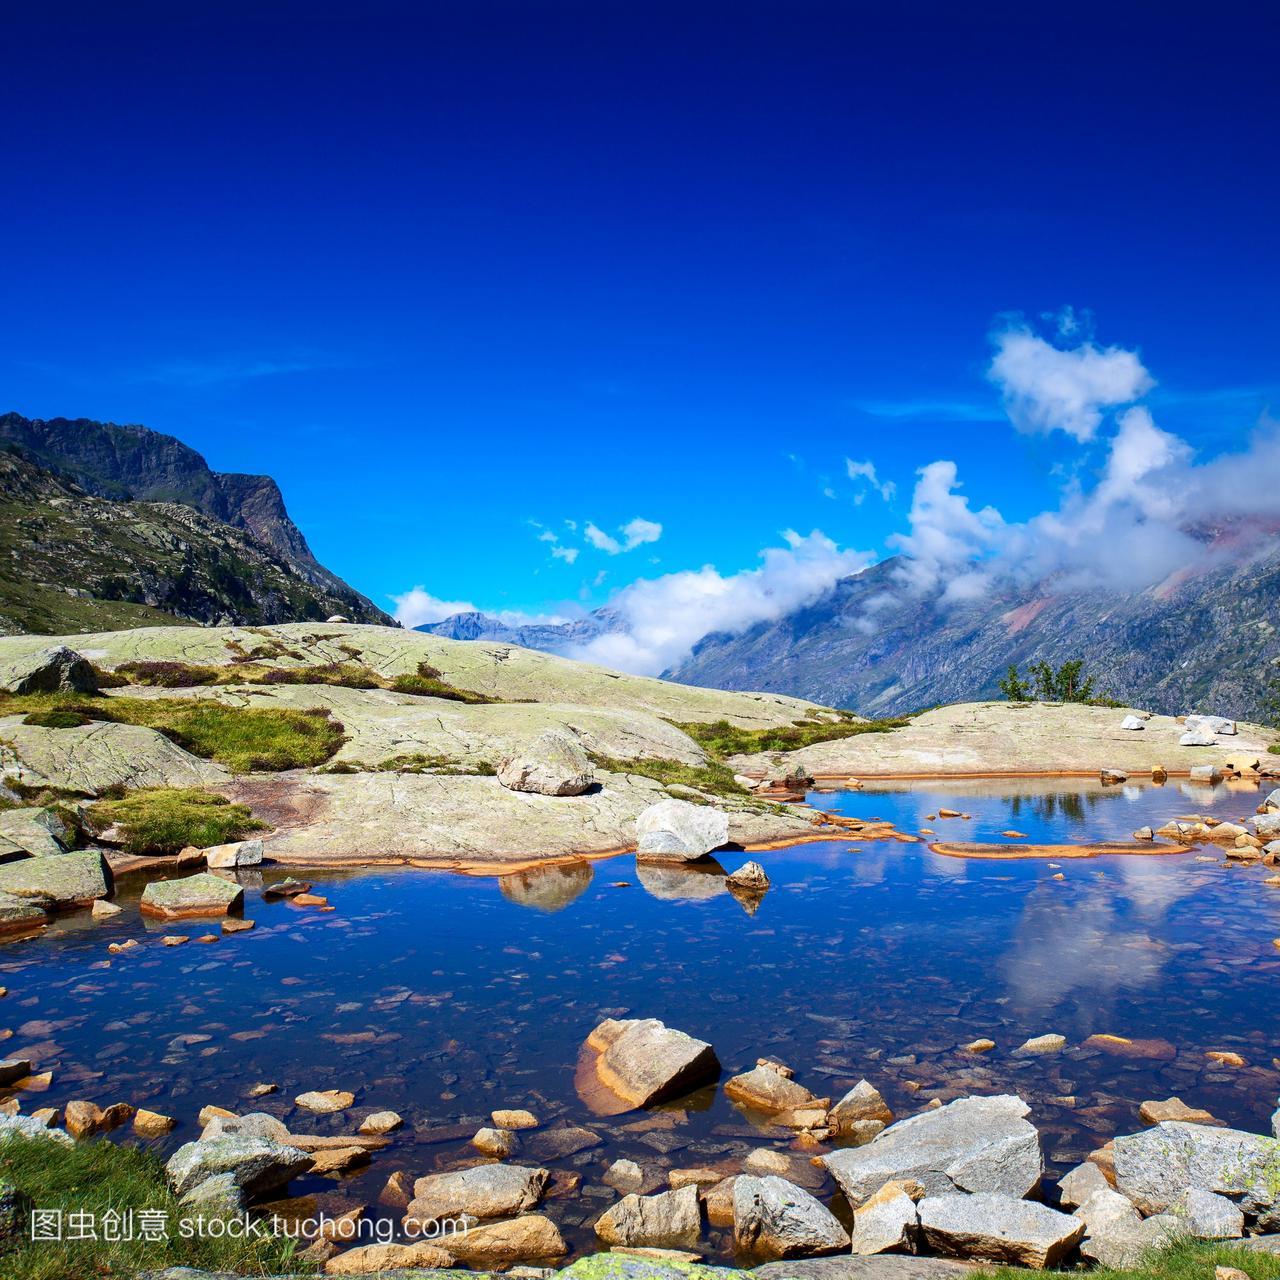 比利牛斯山和湖景观。